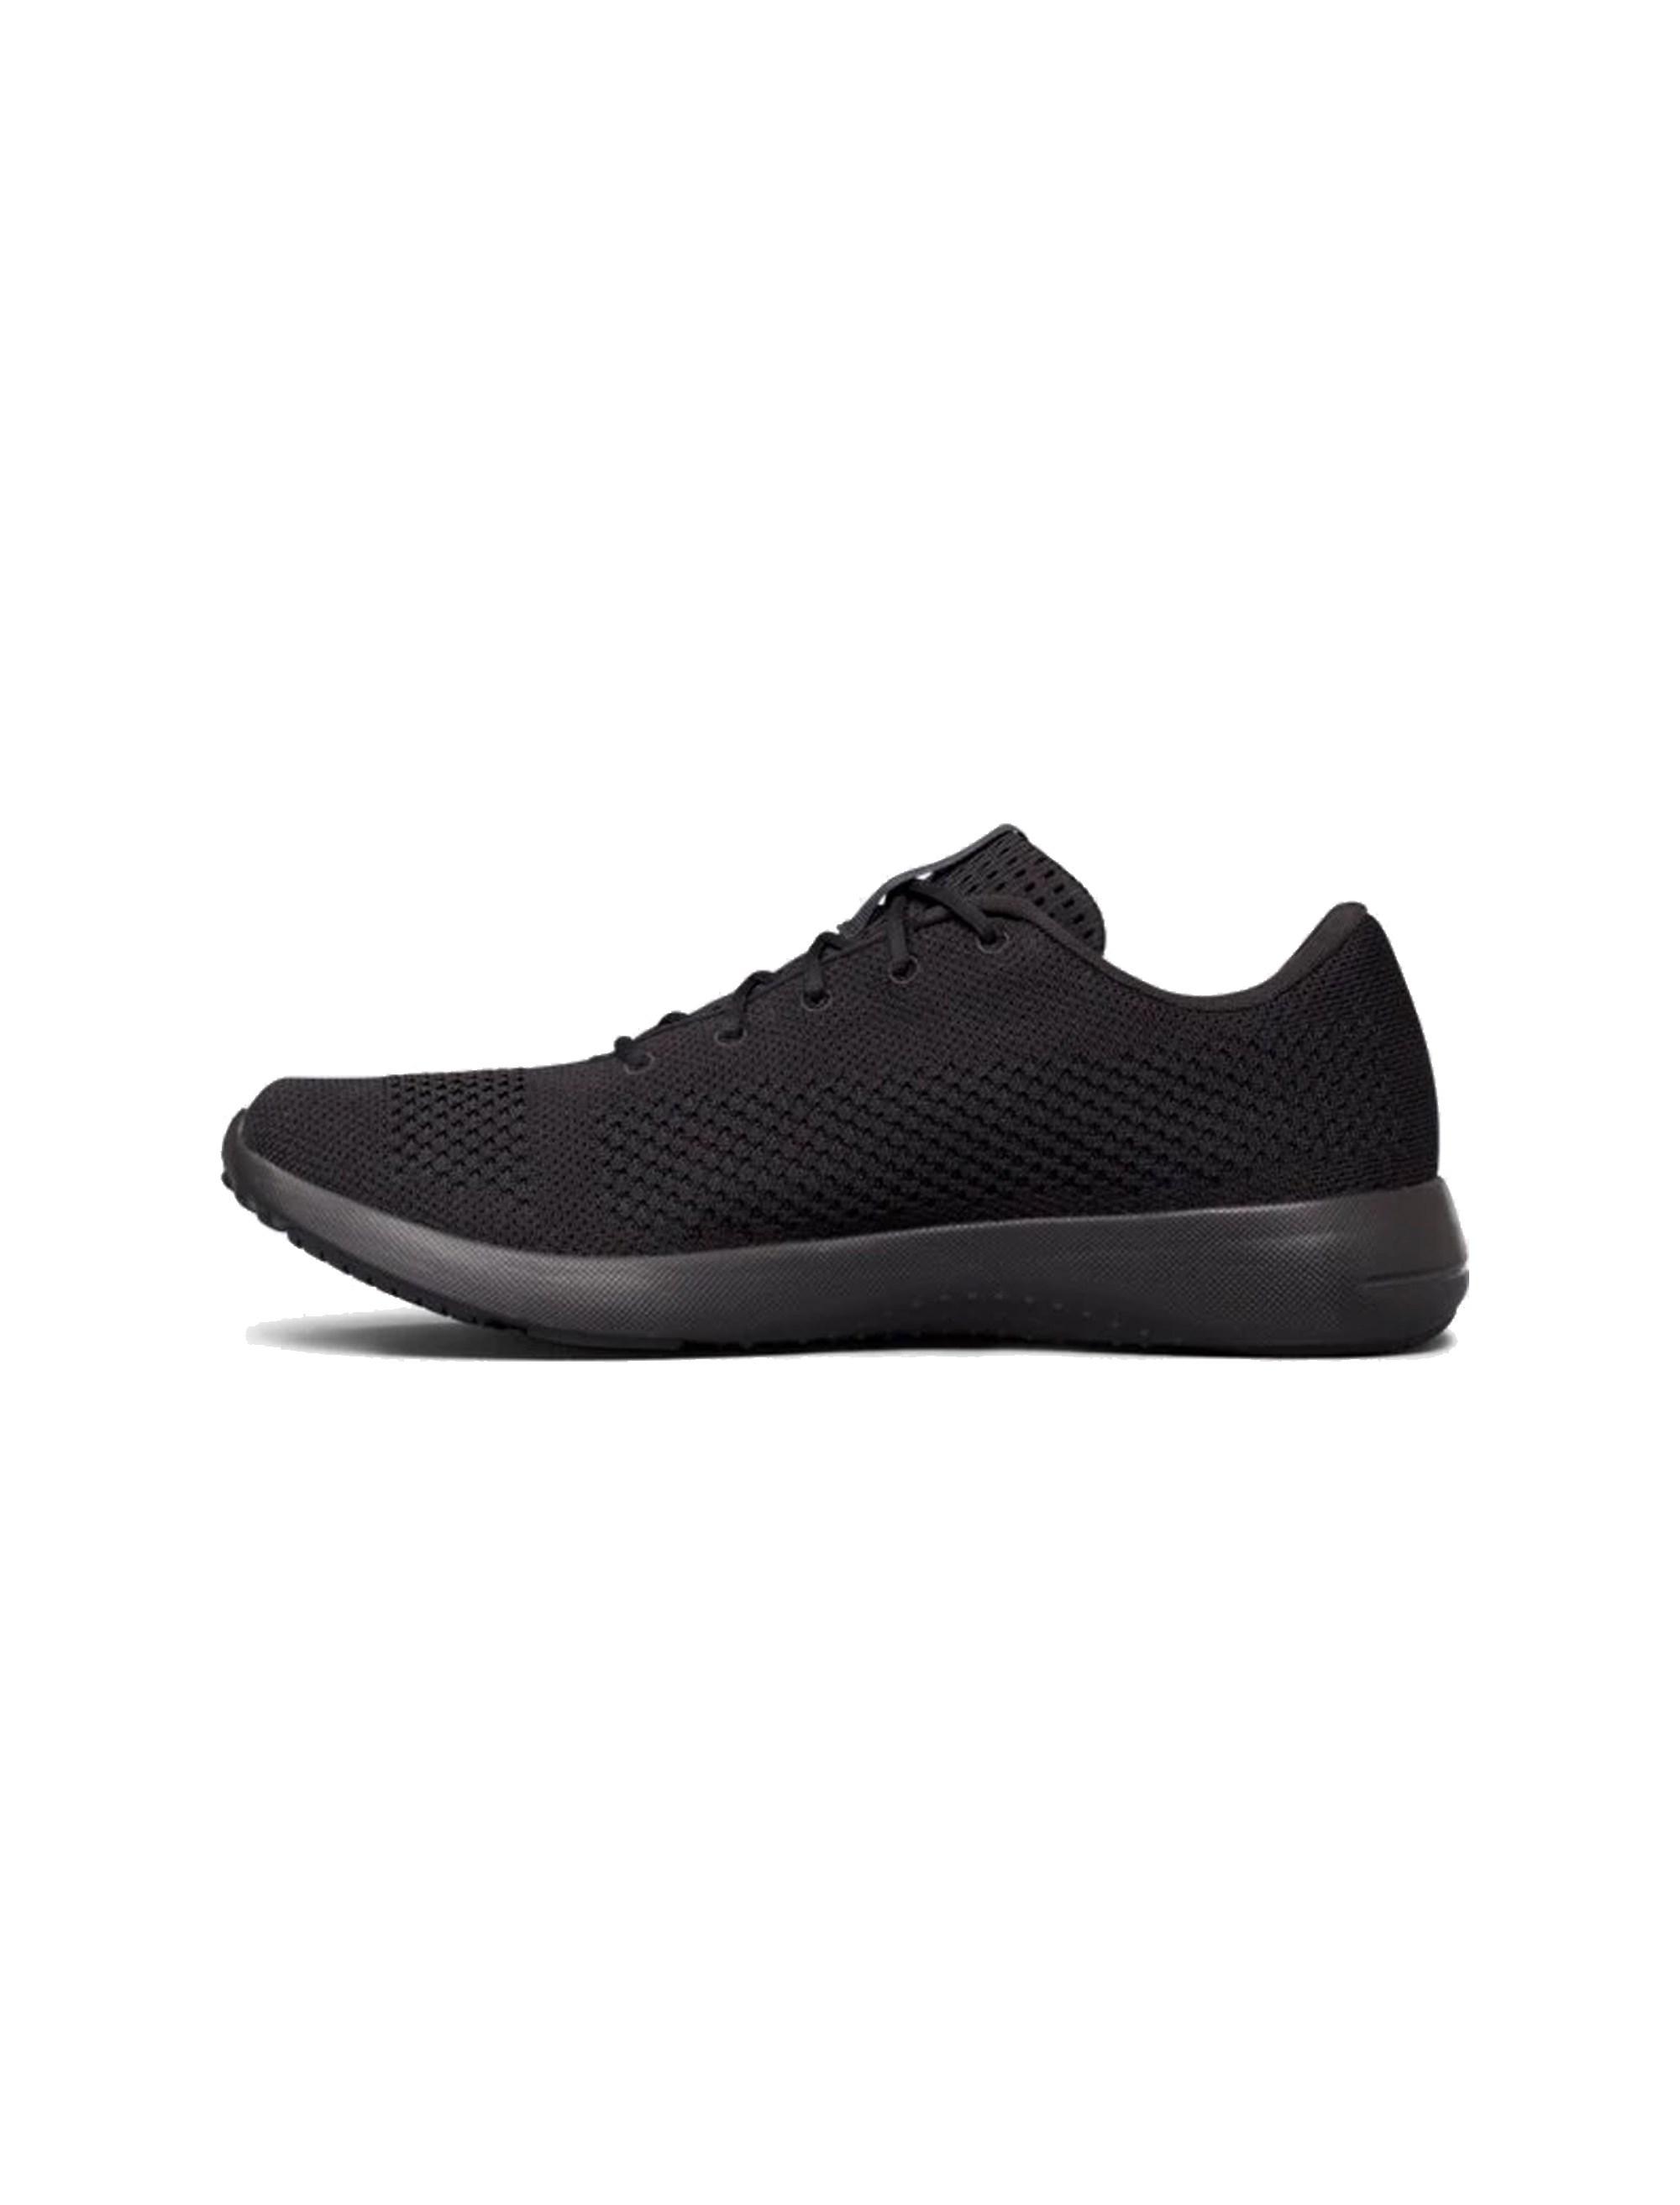 کفش دویدن بندی مردانه Rapid Running Shoes - آندر آرمور